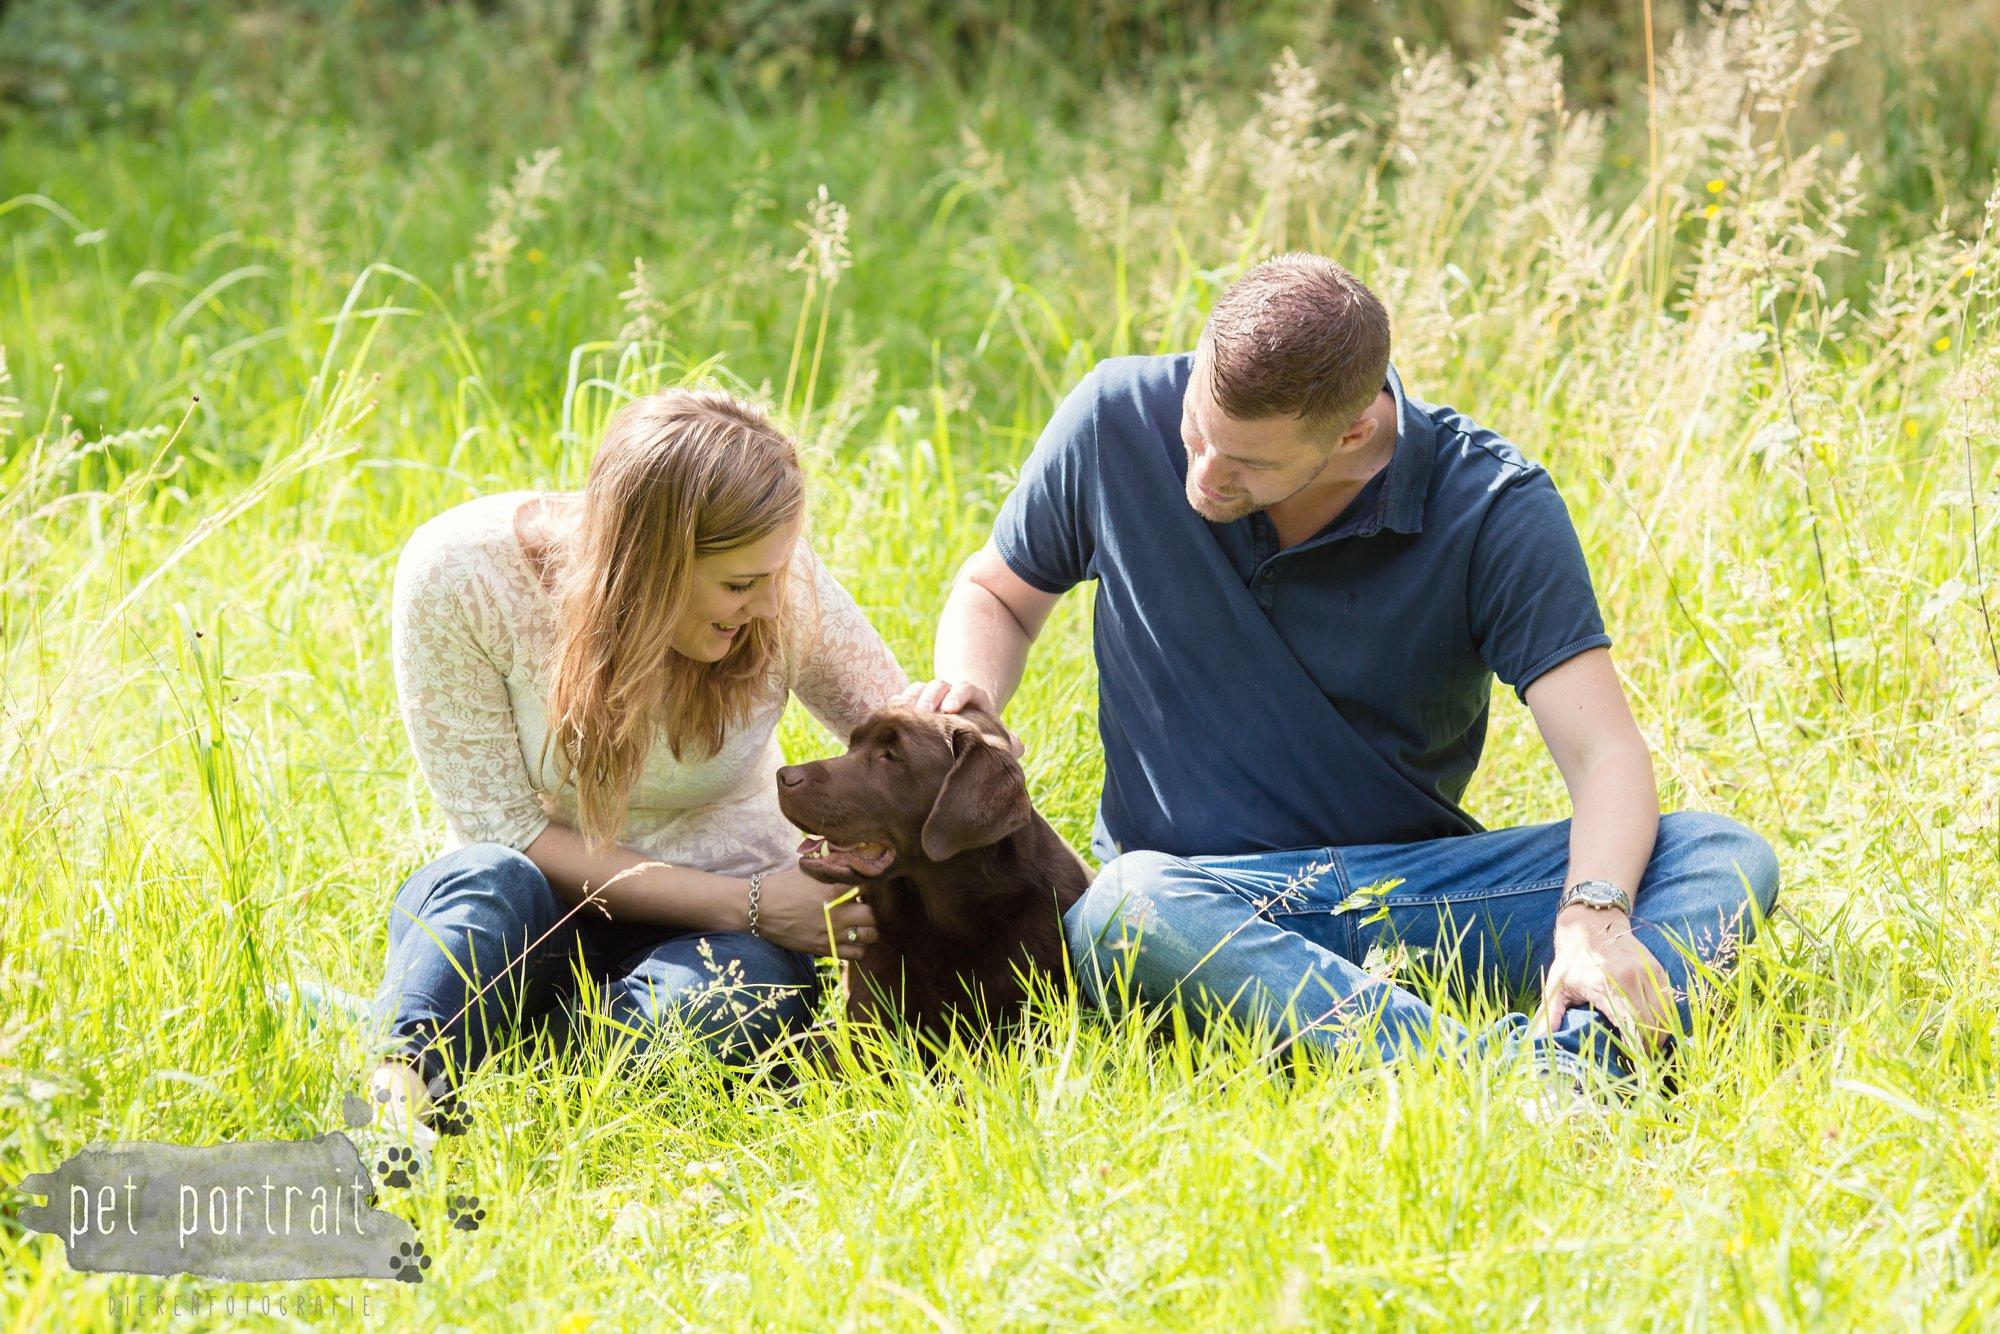 Hondenfotograaf Lelystad - Beloved Dier en Baasje fotoshoot-10